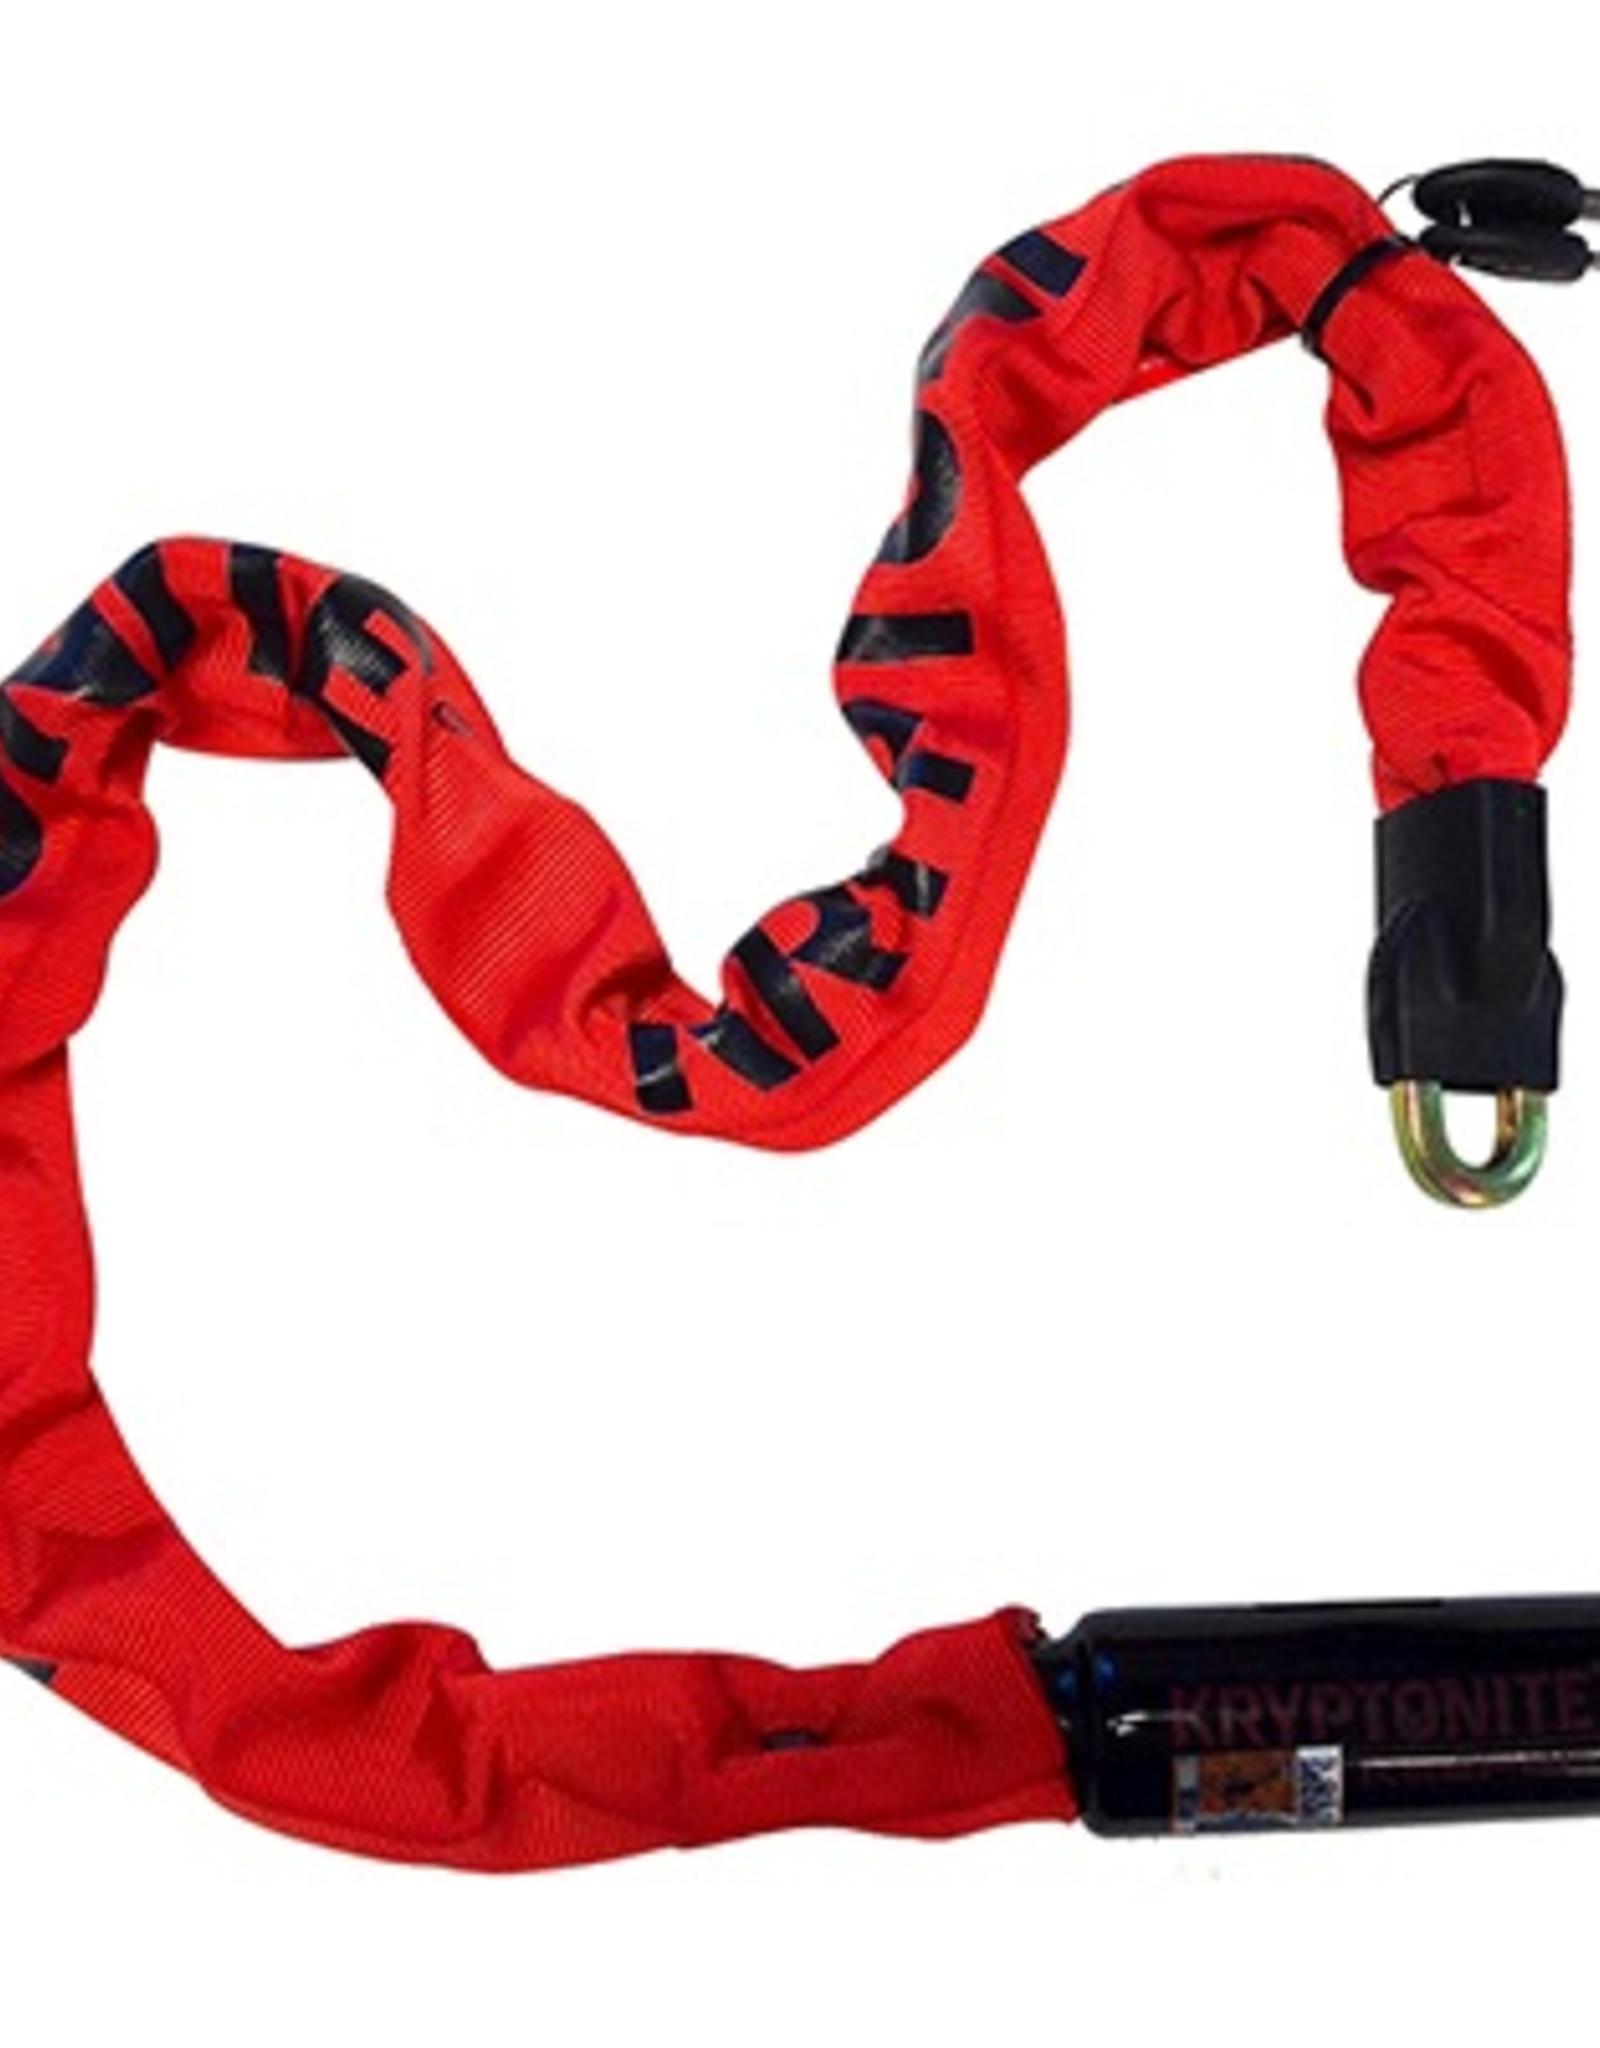 Kryptonite Kryptonite Keeper 785 Integrated Chain Lock, 3 Feet, Red